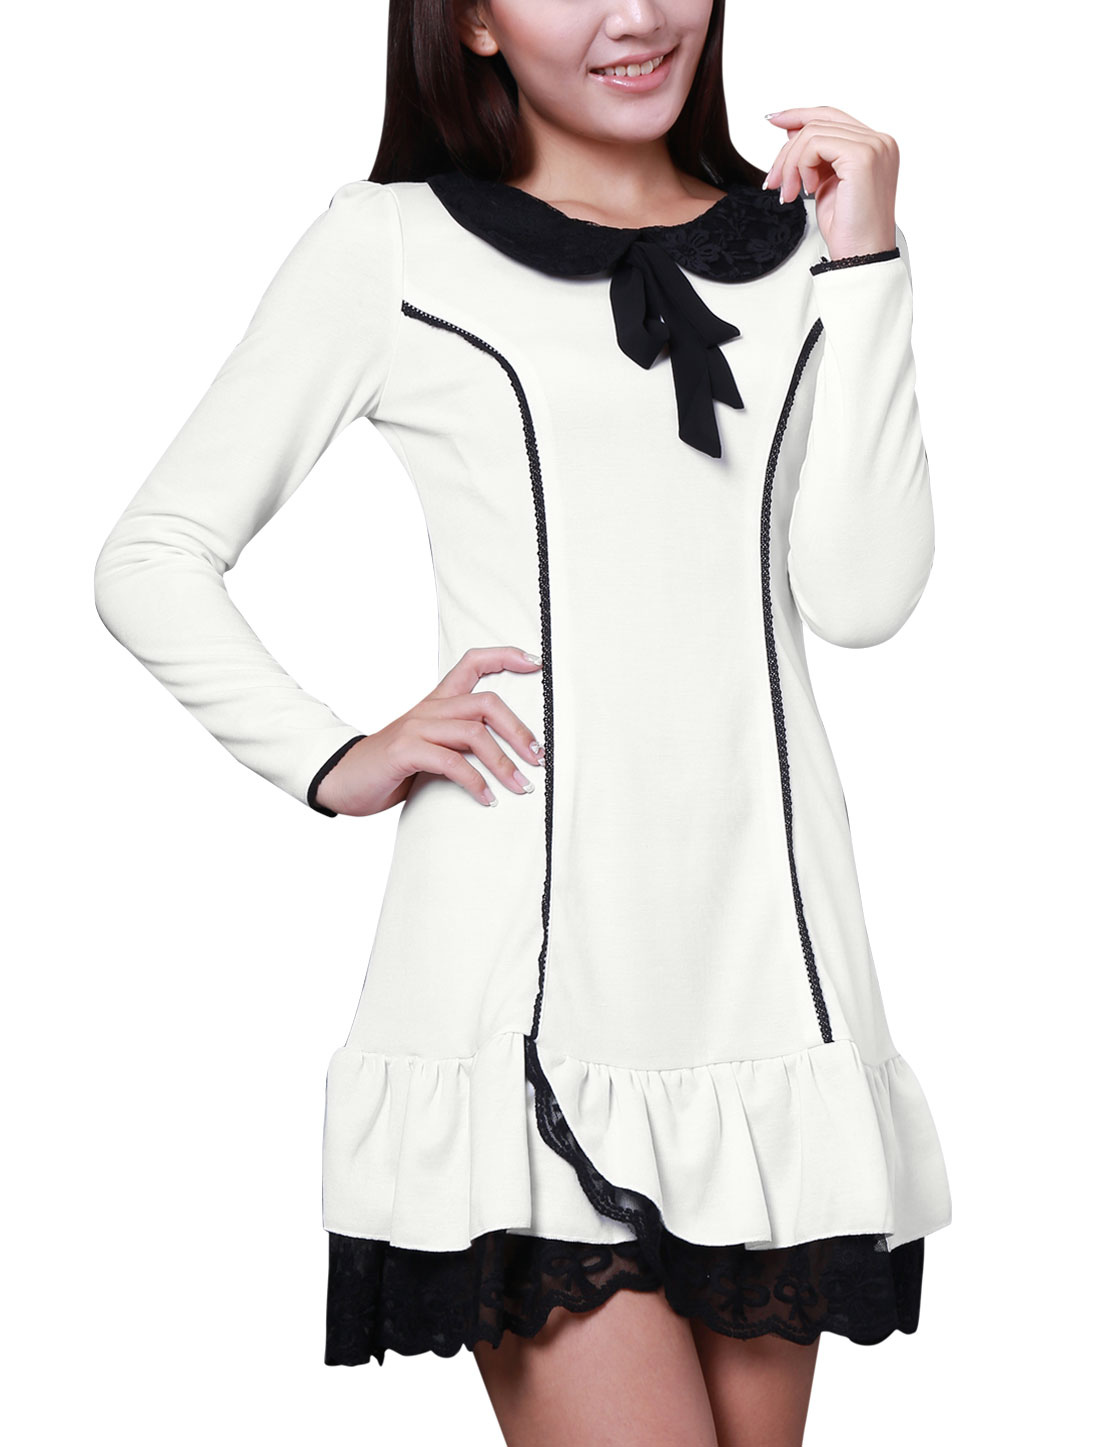 Ladies Peter Pan Collar Long Sleeve Scalloped Hem Mini Dress White XS